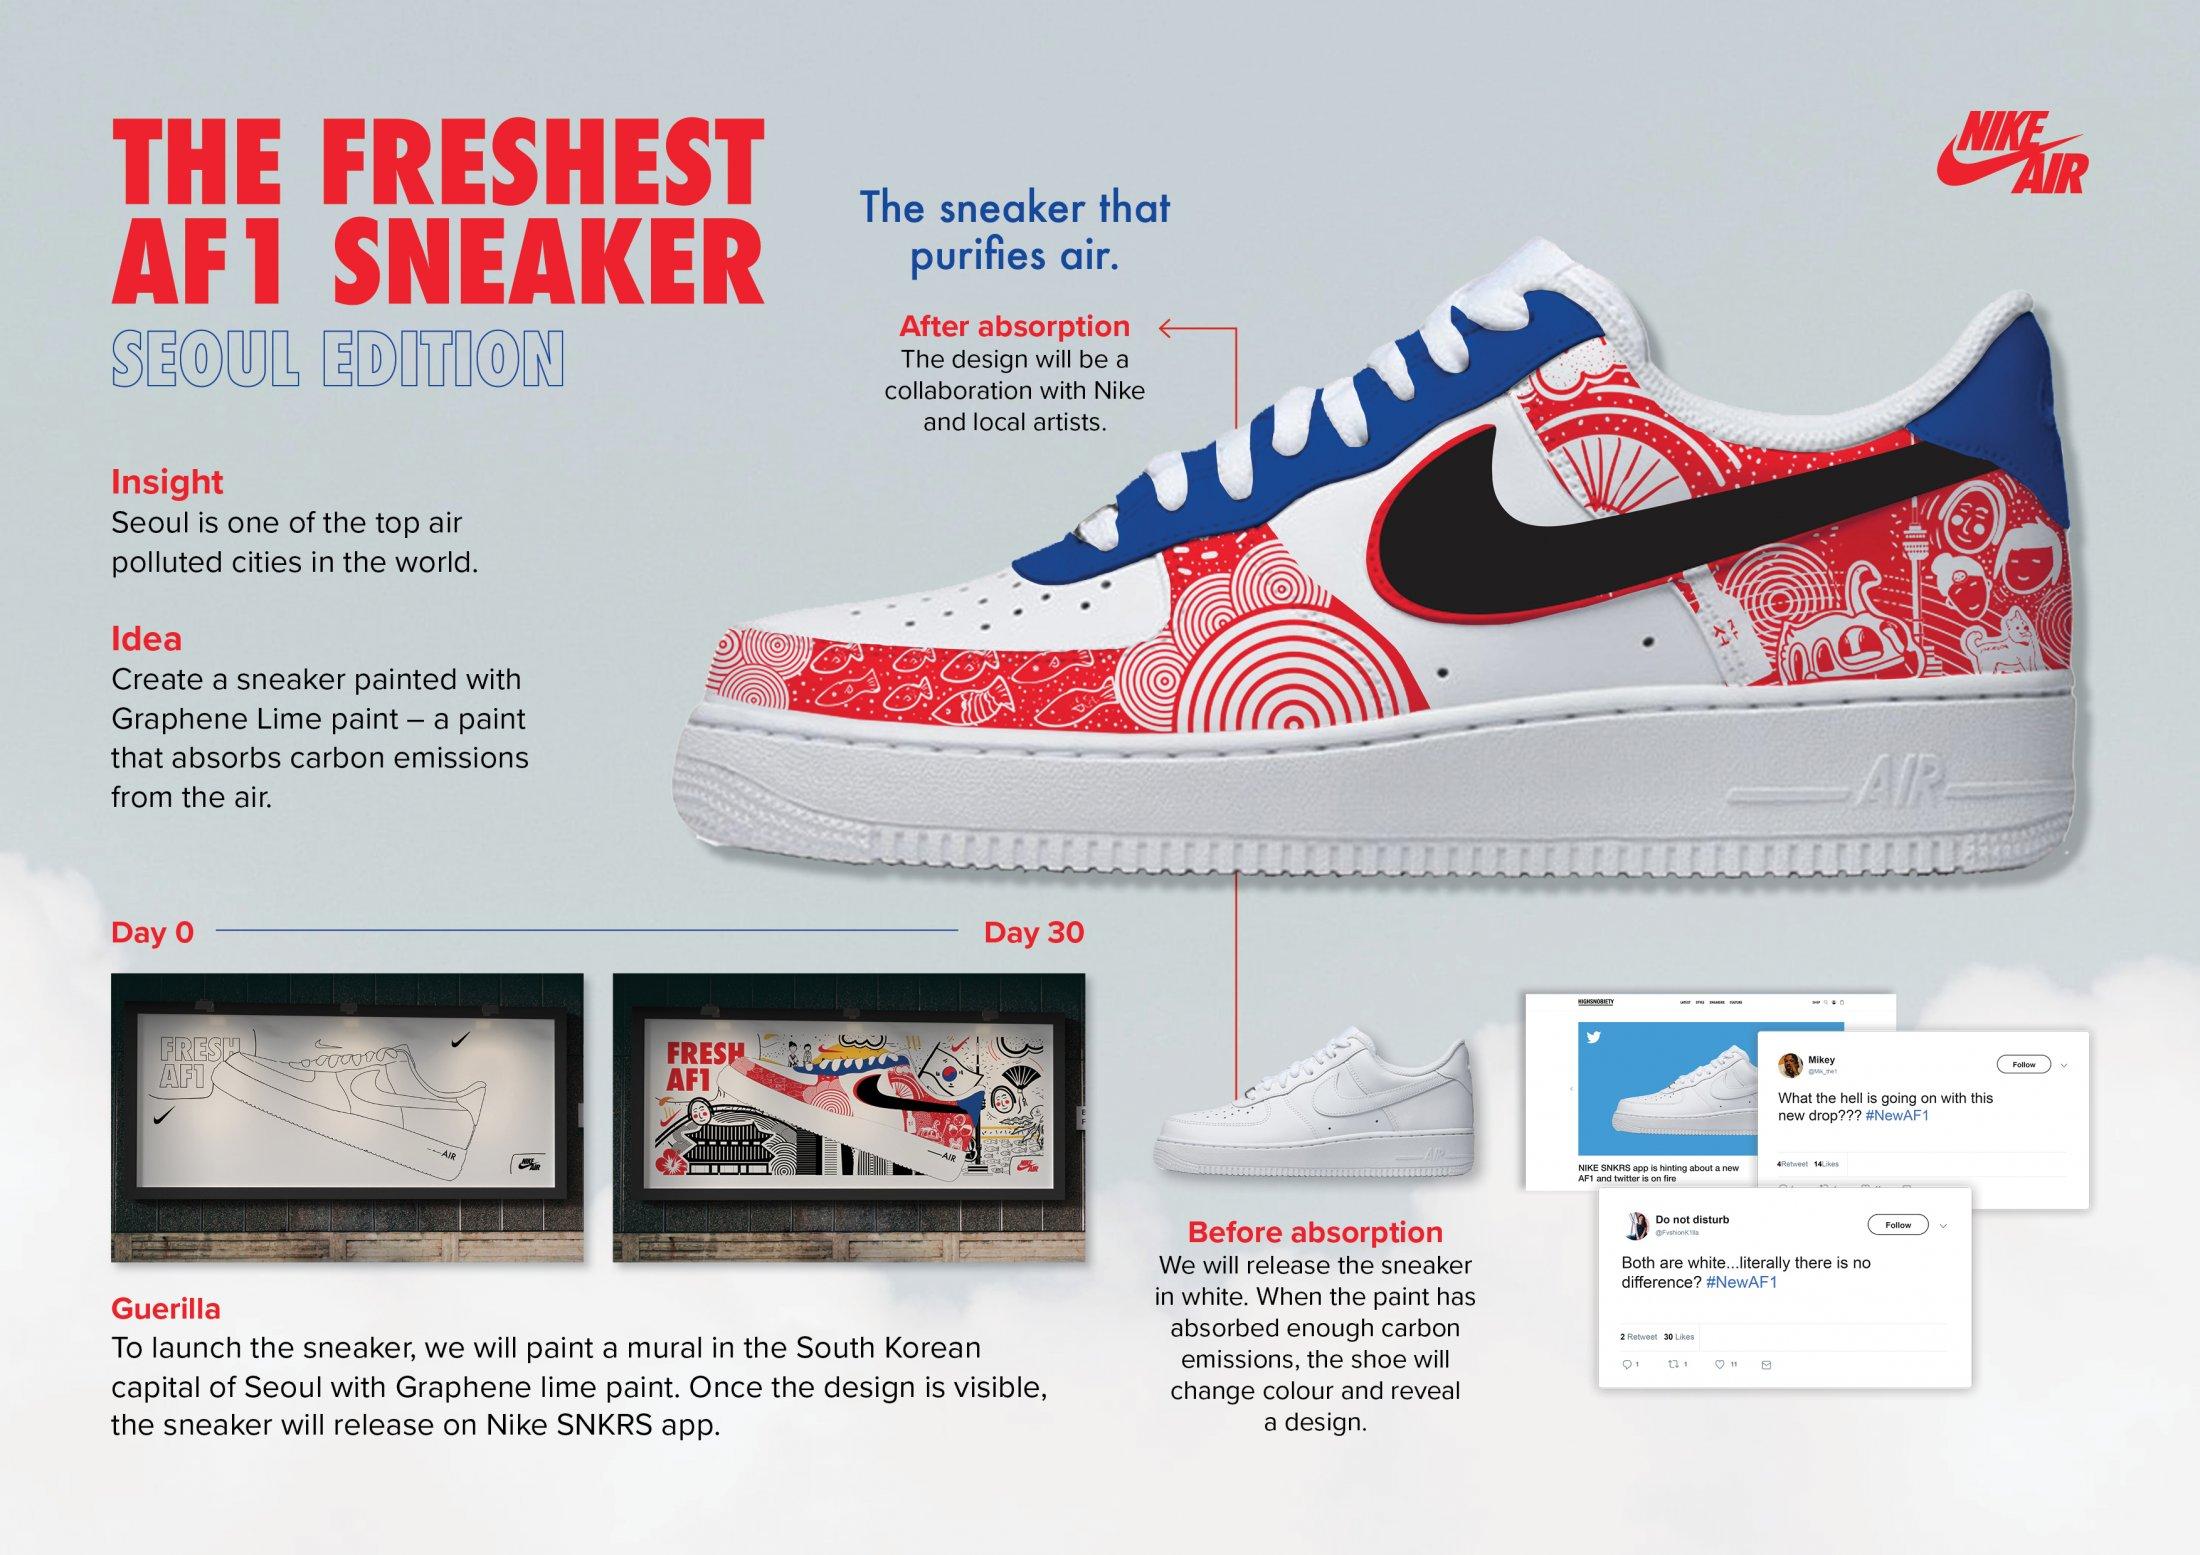 Thumbnail for The Freshest AF1 Sneaker